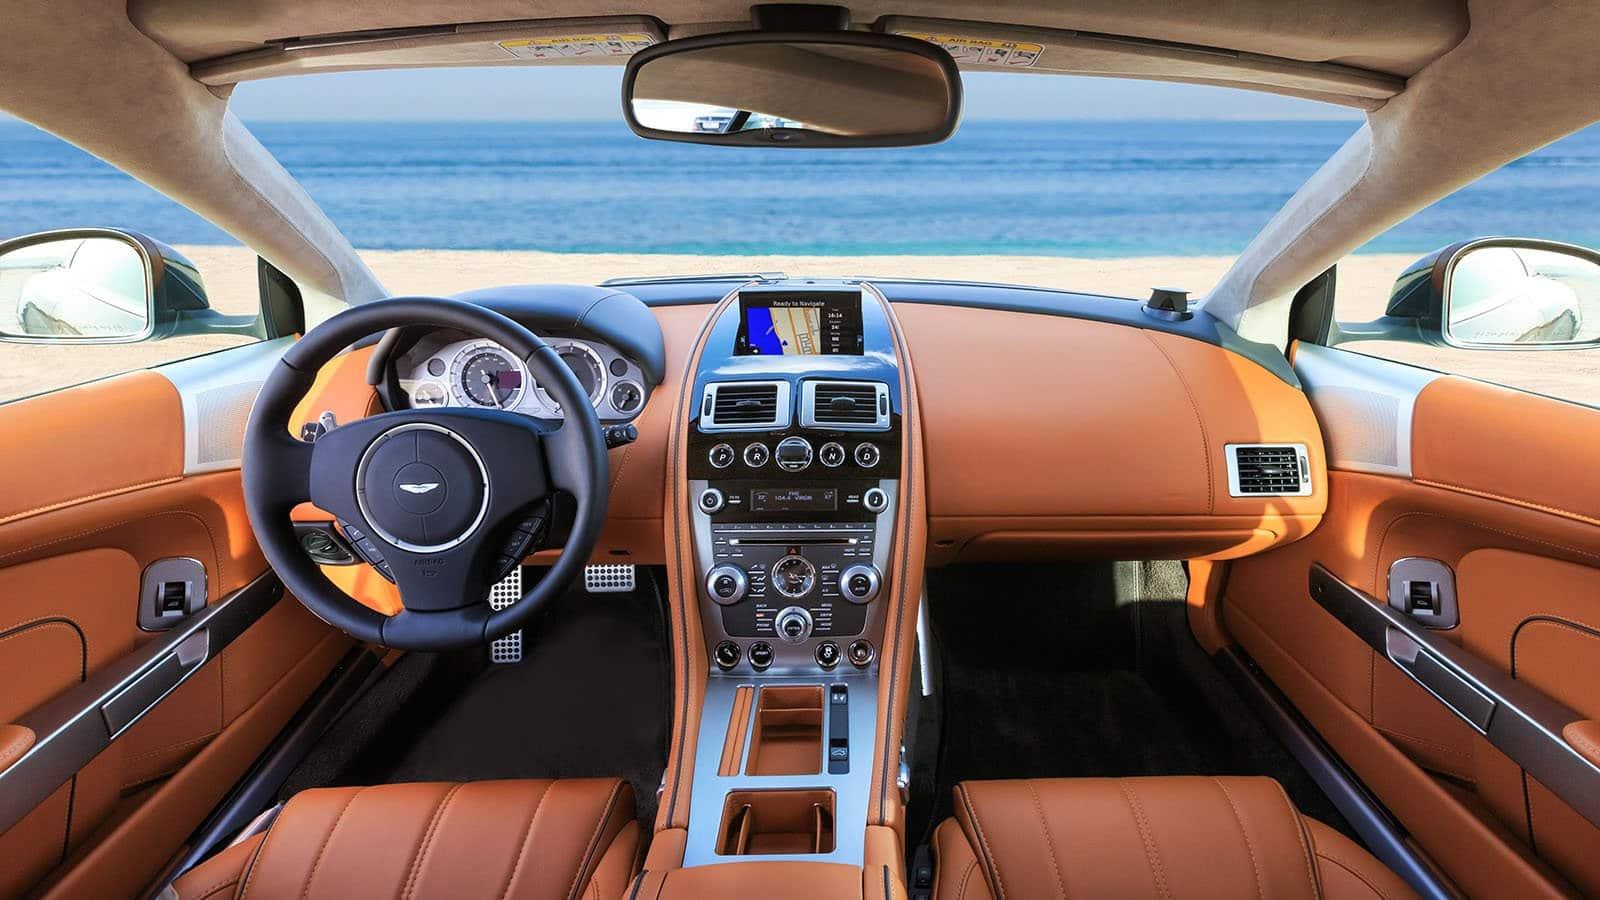 Aston Martin DB9 Car Renal Dubai